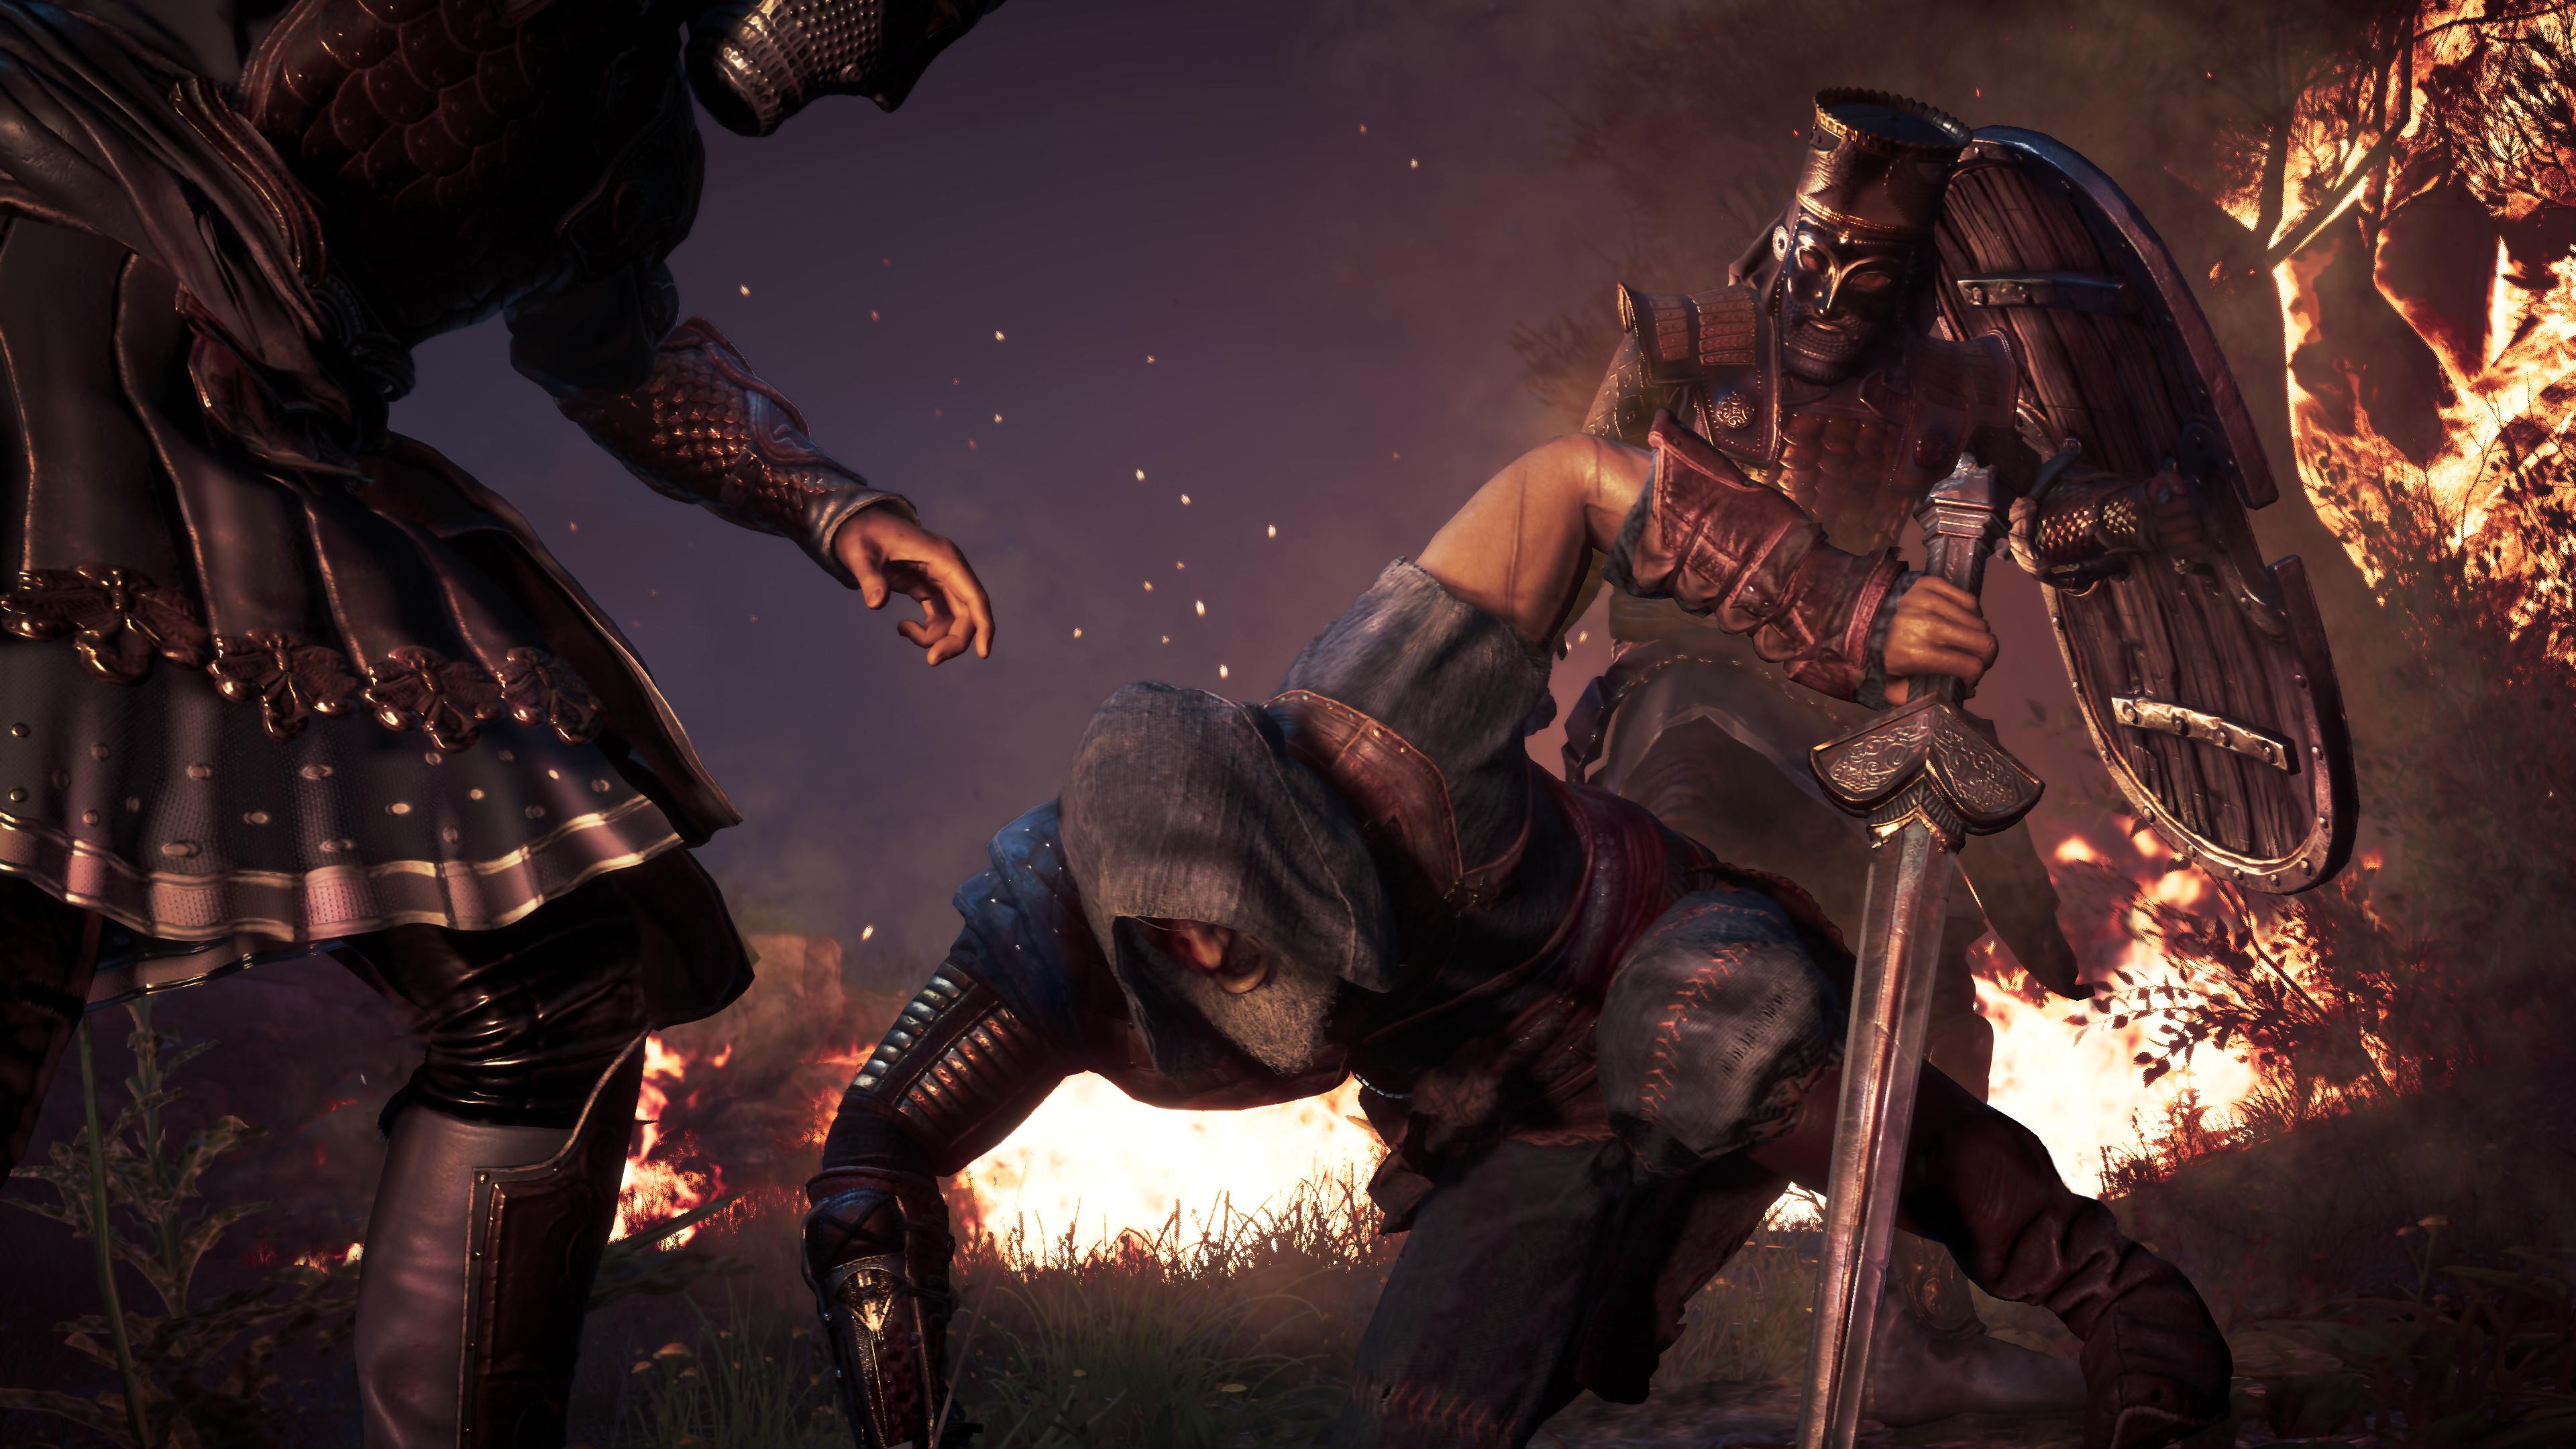 Assassin's Creed Odyssey : l'épisode final du premier arc narratif